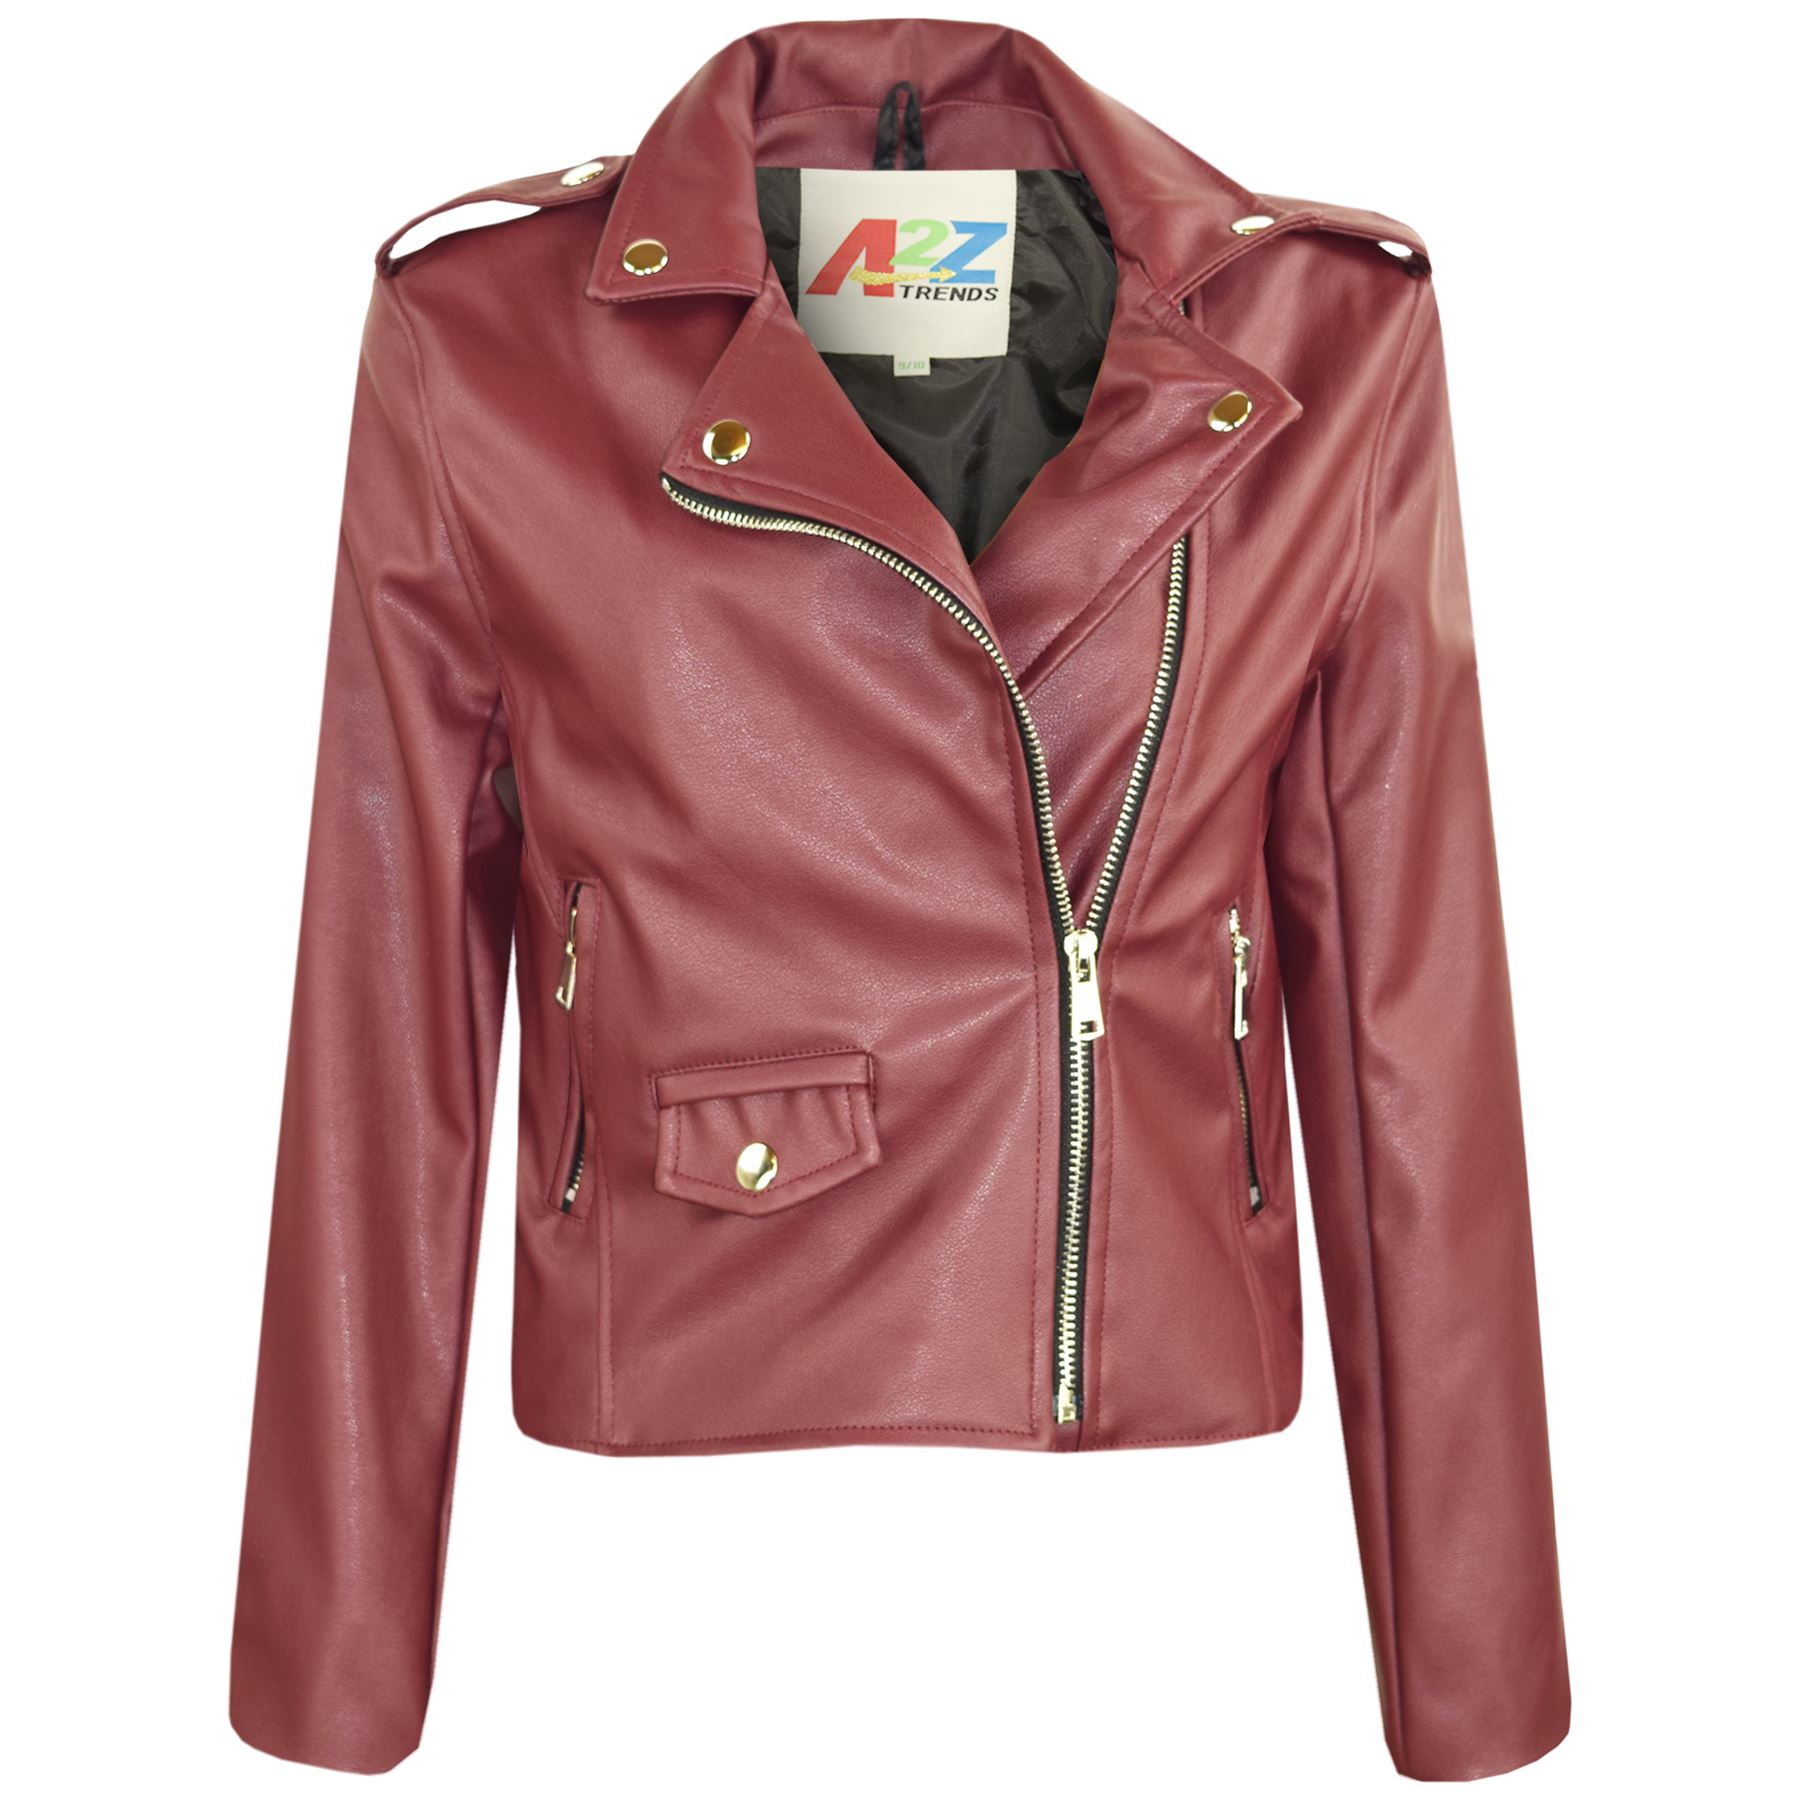 Kids-Enfiler-Girls-Designer-039-s-PU-Leather-Wine-Jacket-Zip-Up-Biker-Coats-5-13-ecole